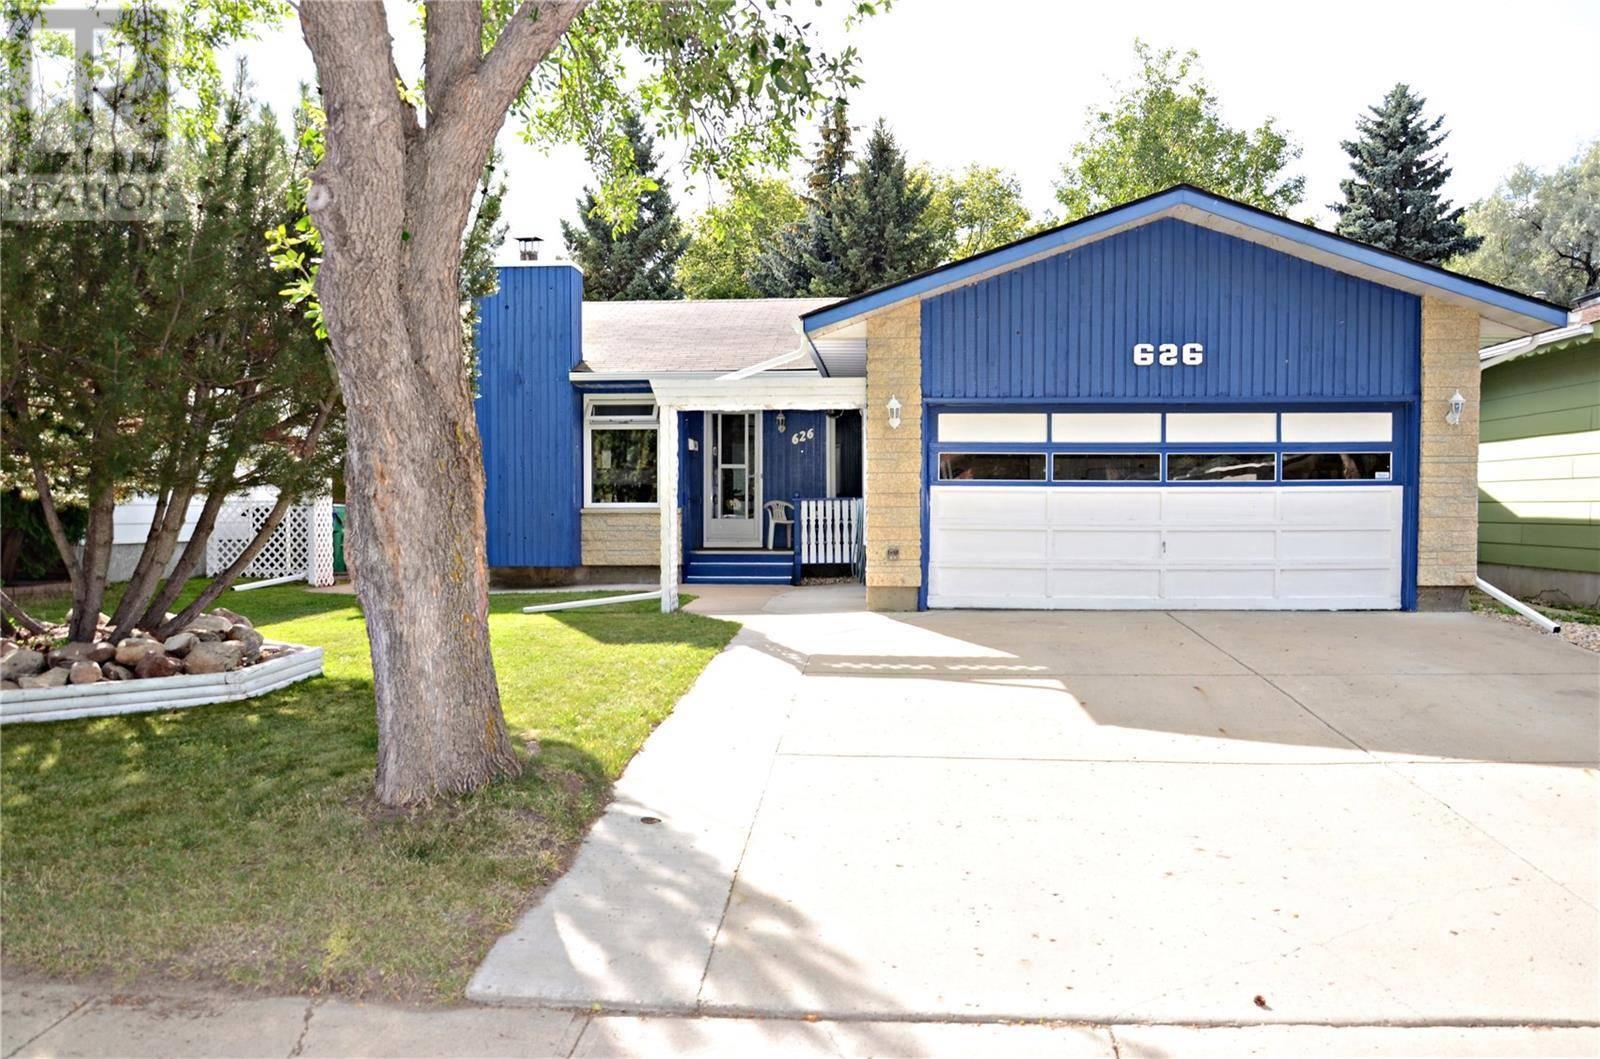 House for sale at 626 Redberry Rd Saskatoon Saskatchewan - MLS: SK783651